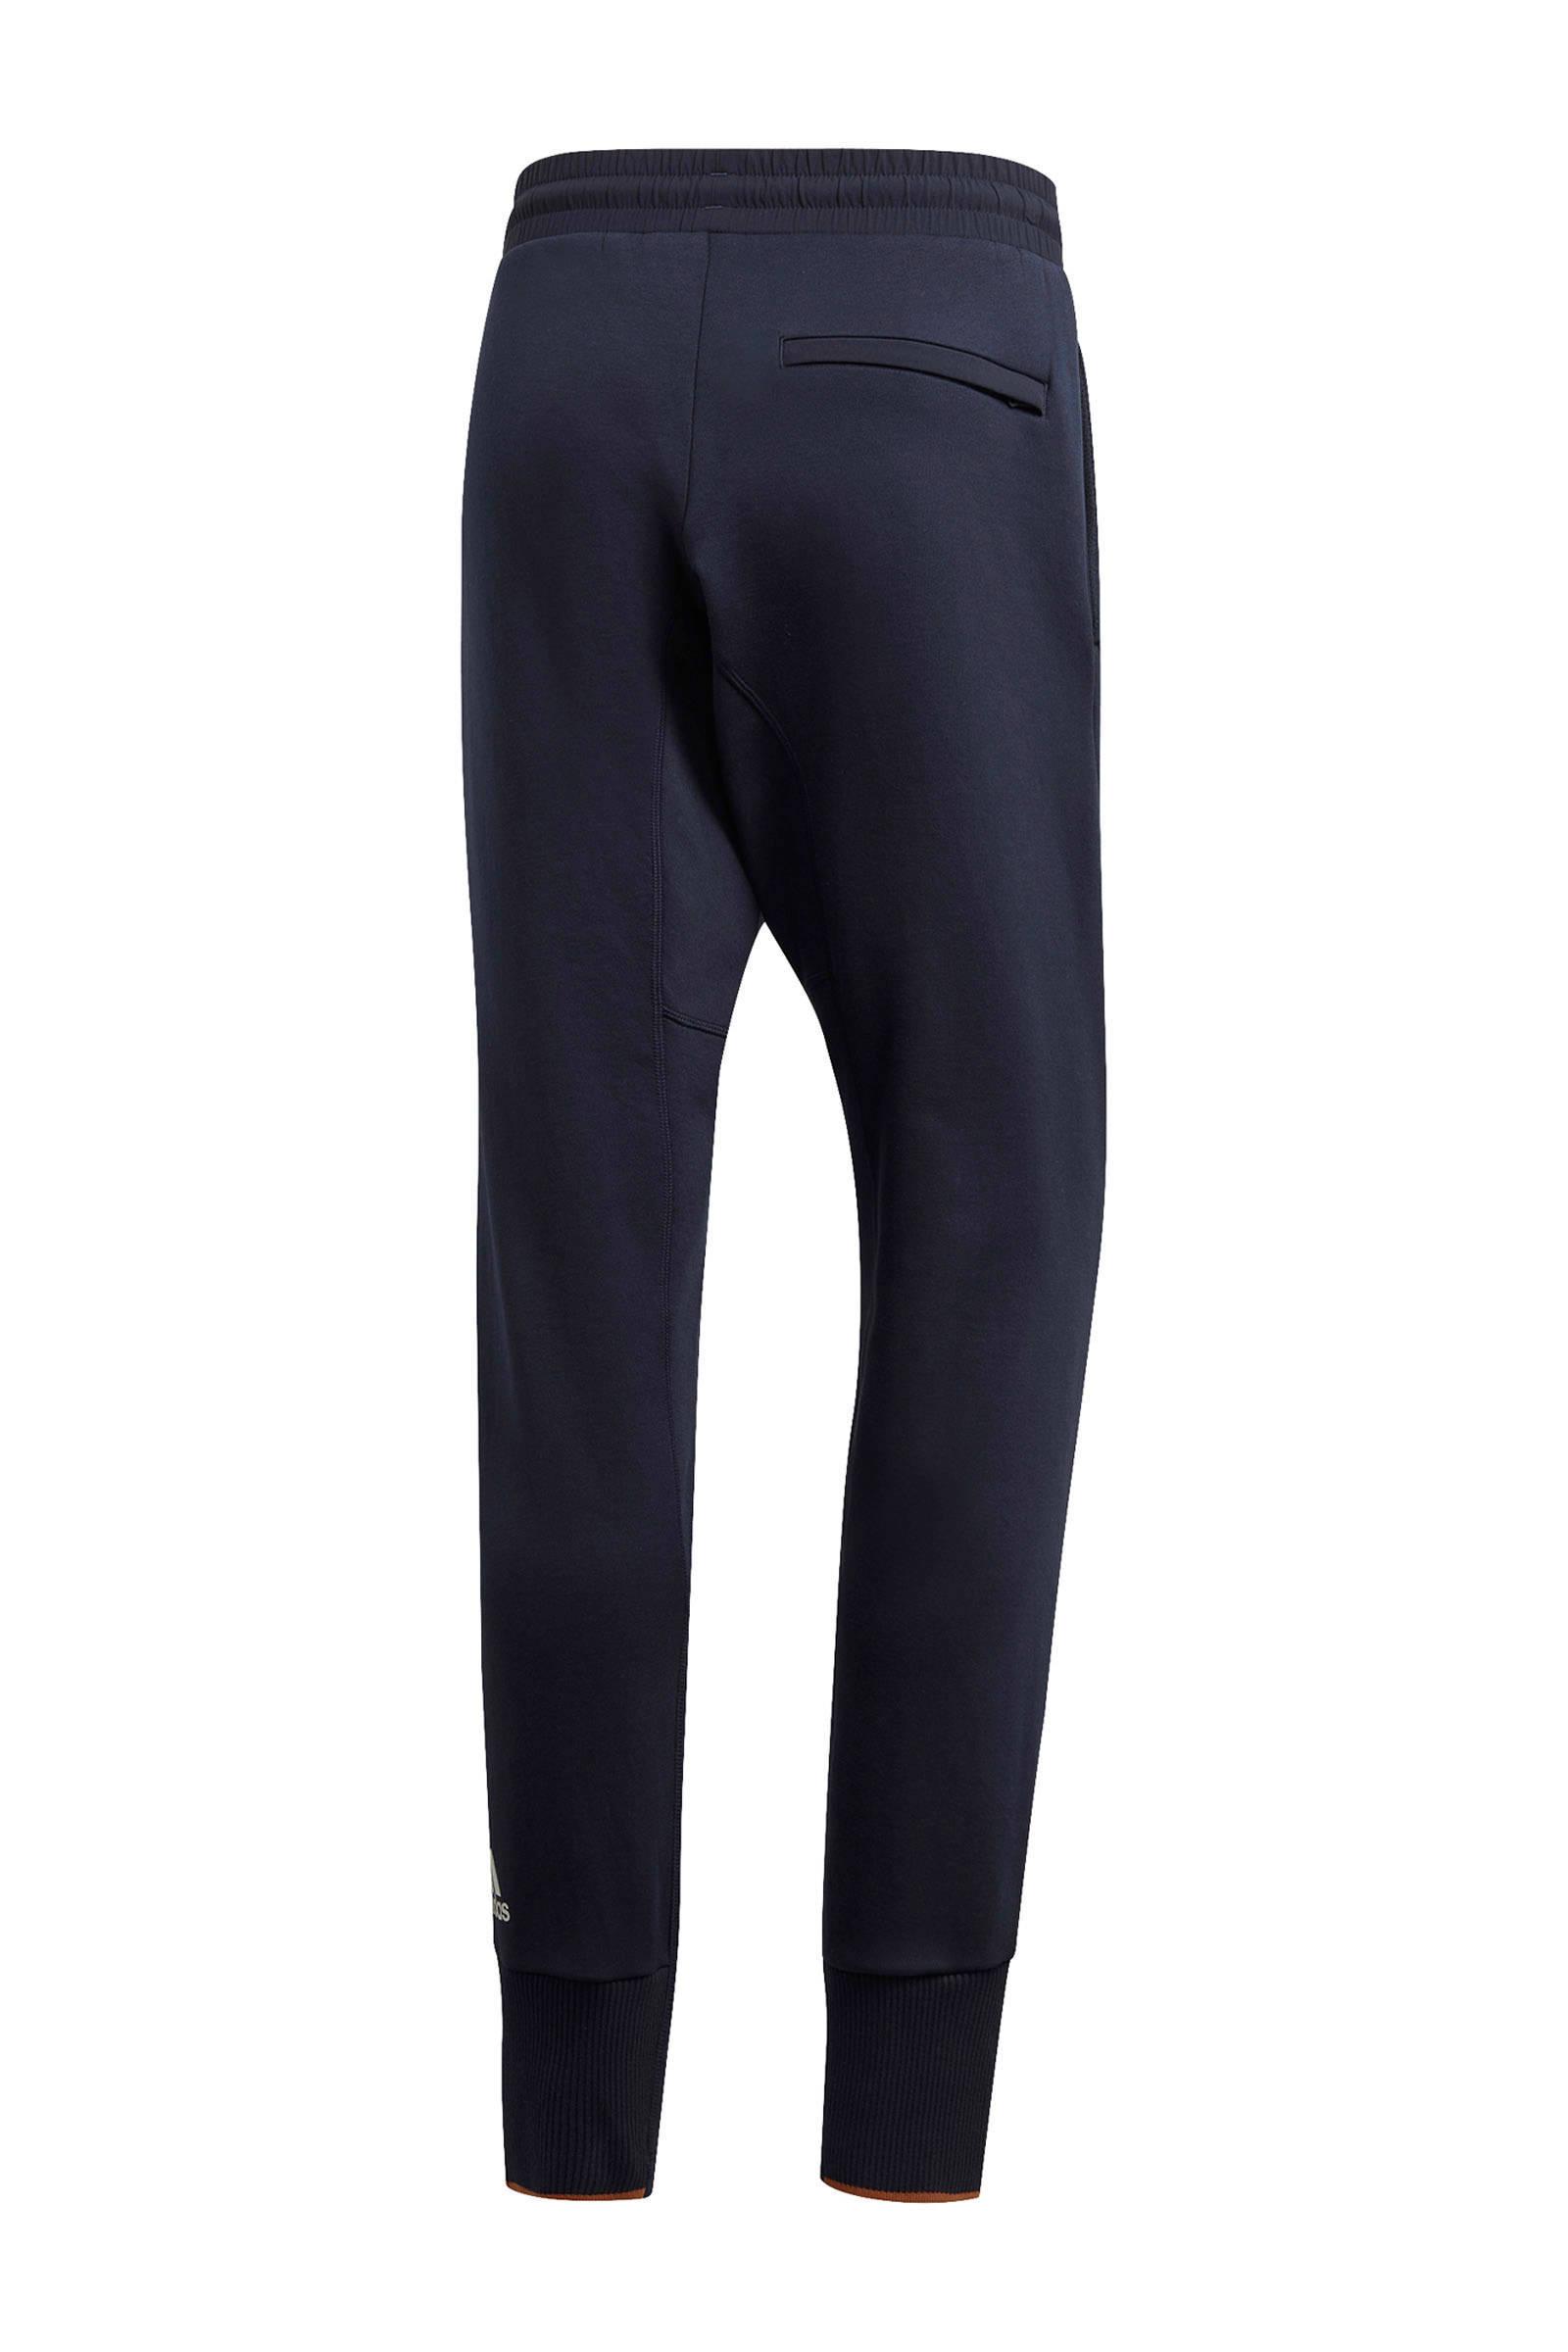 adidas Performance slim fit joggingbroek donkerblauw | wehkamp